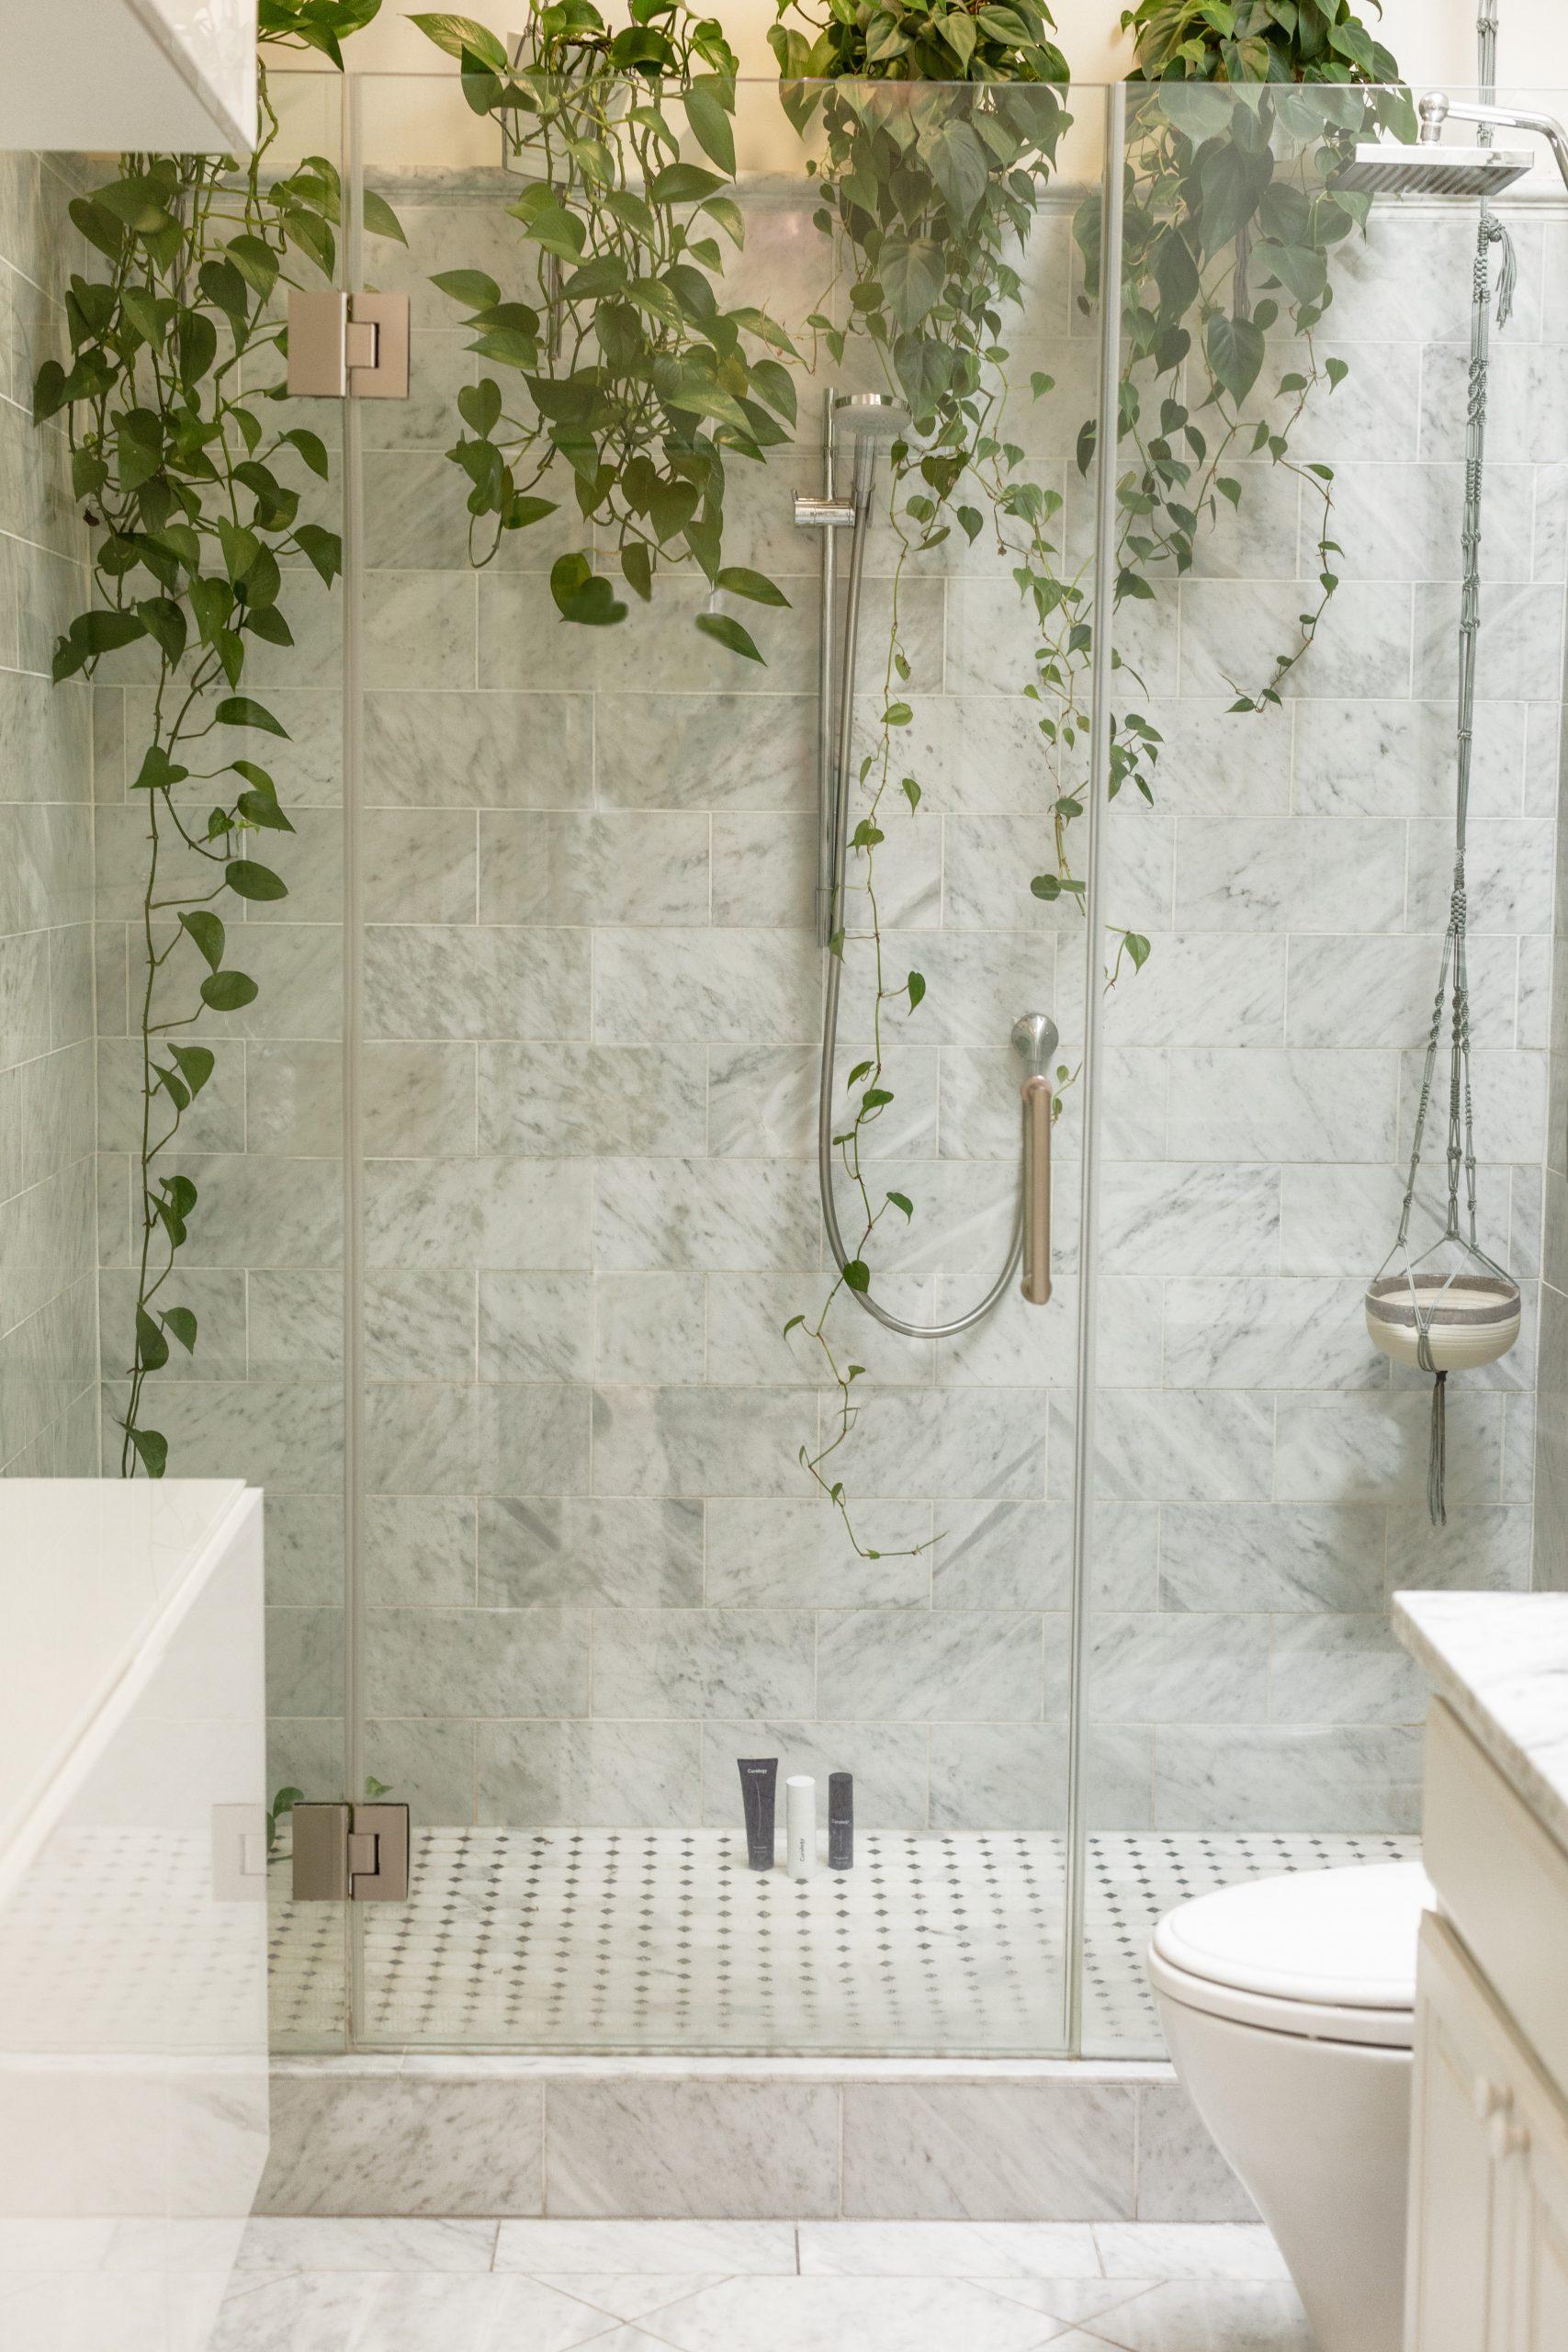 Bernd Bucher Badezimmer nachhaltig